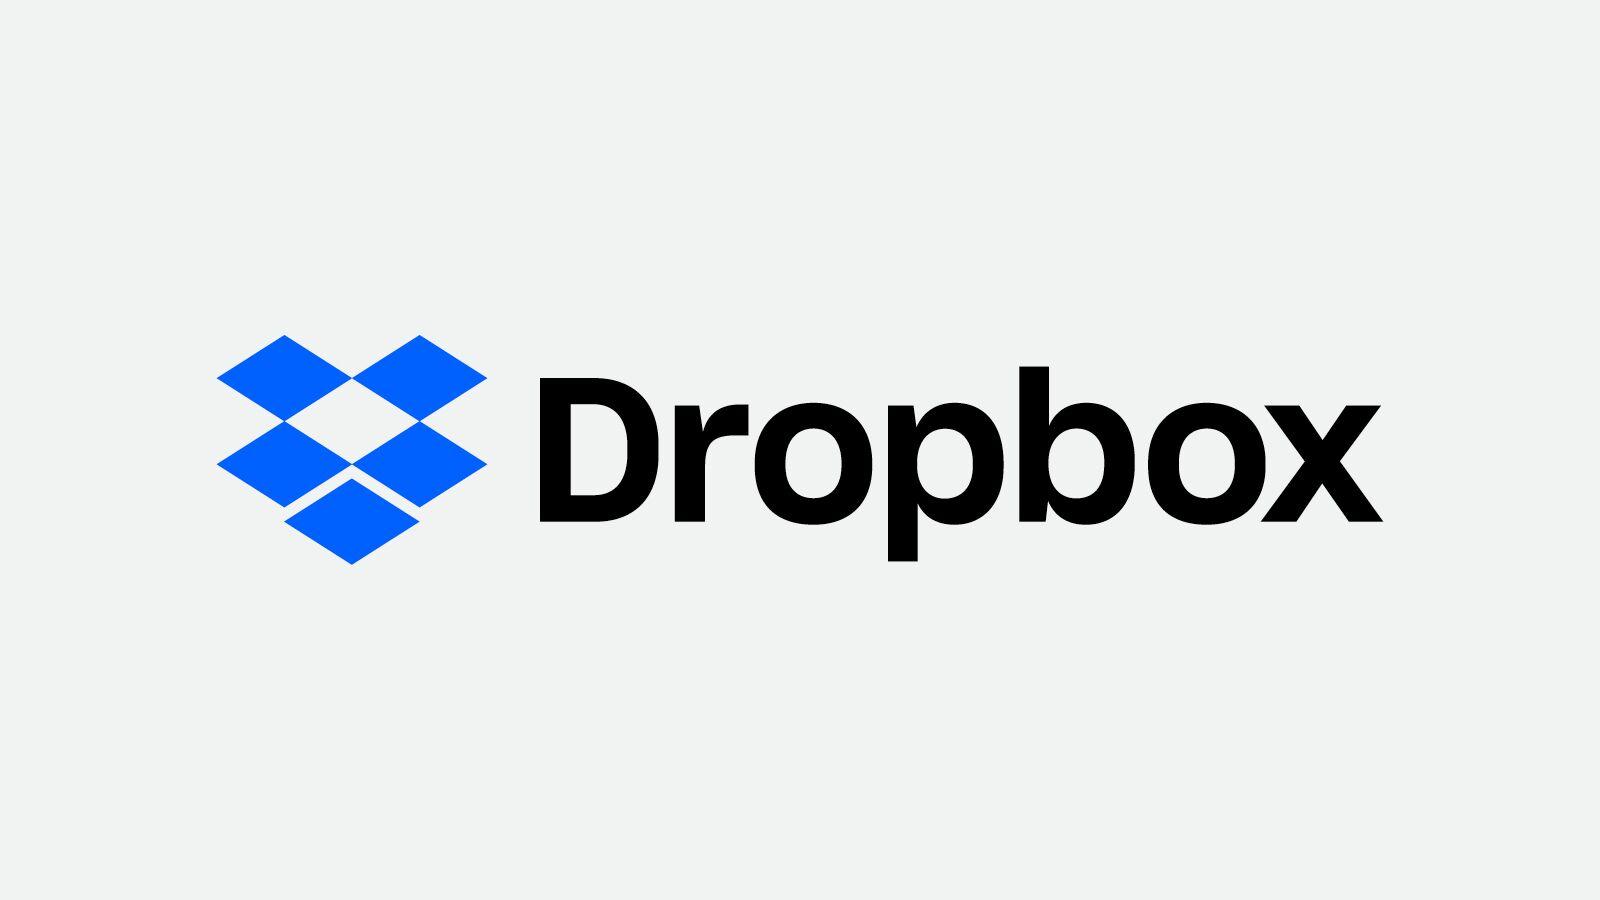 Using Dropbox for large magazine image submission